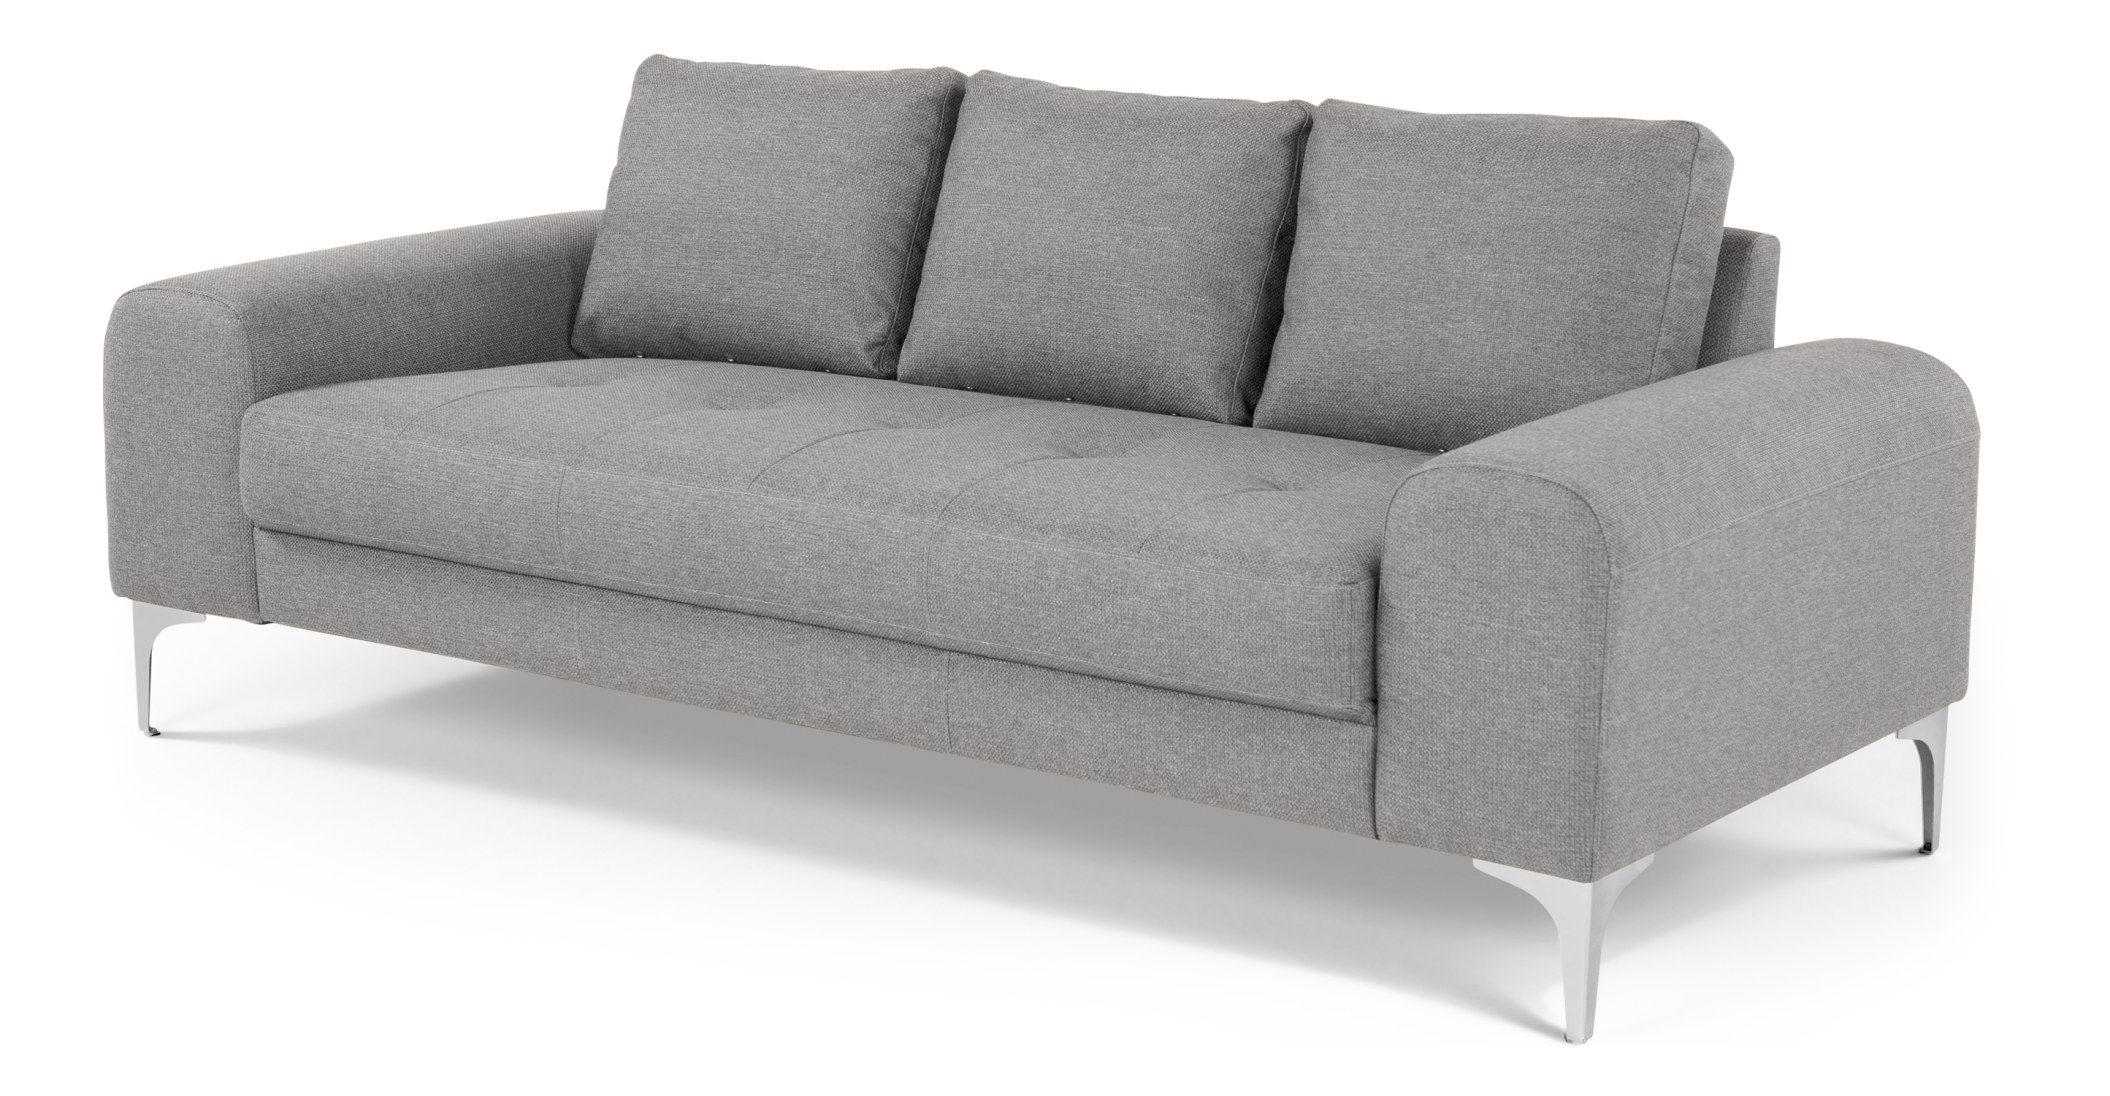 Made Pearl Grey Sofa In 2020 Sofa 3 Seater Sofa Pearl Grey